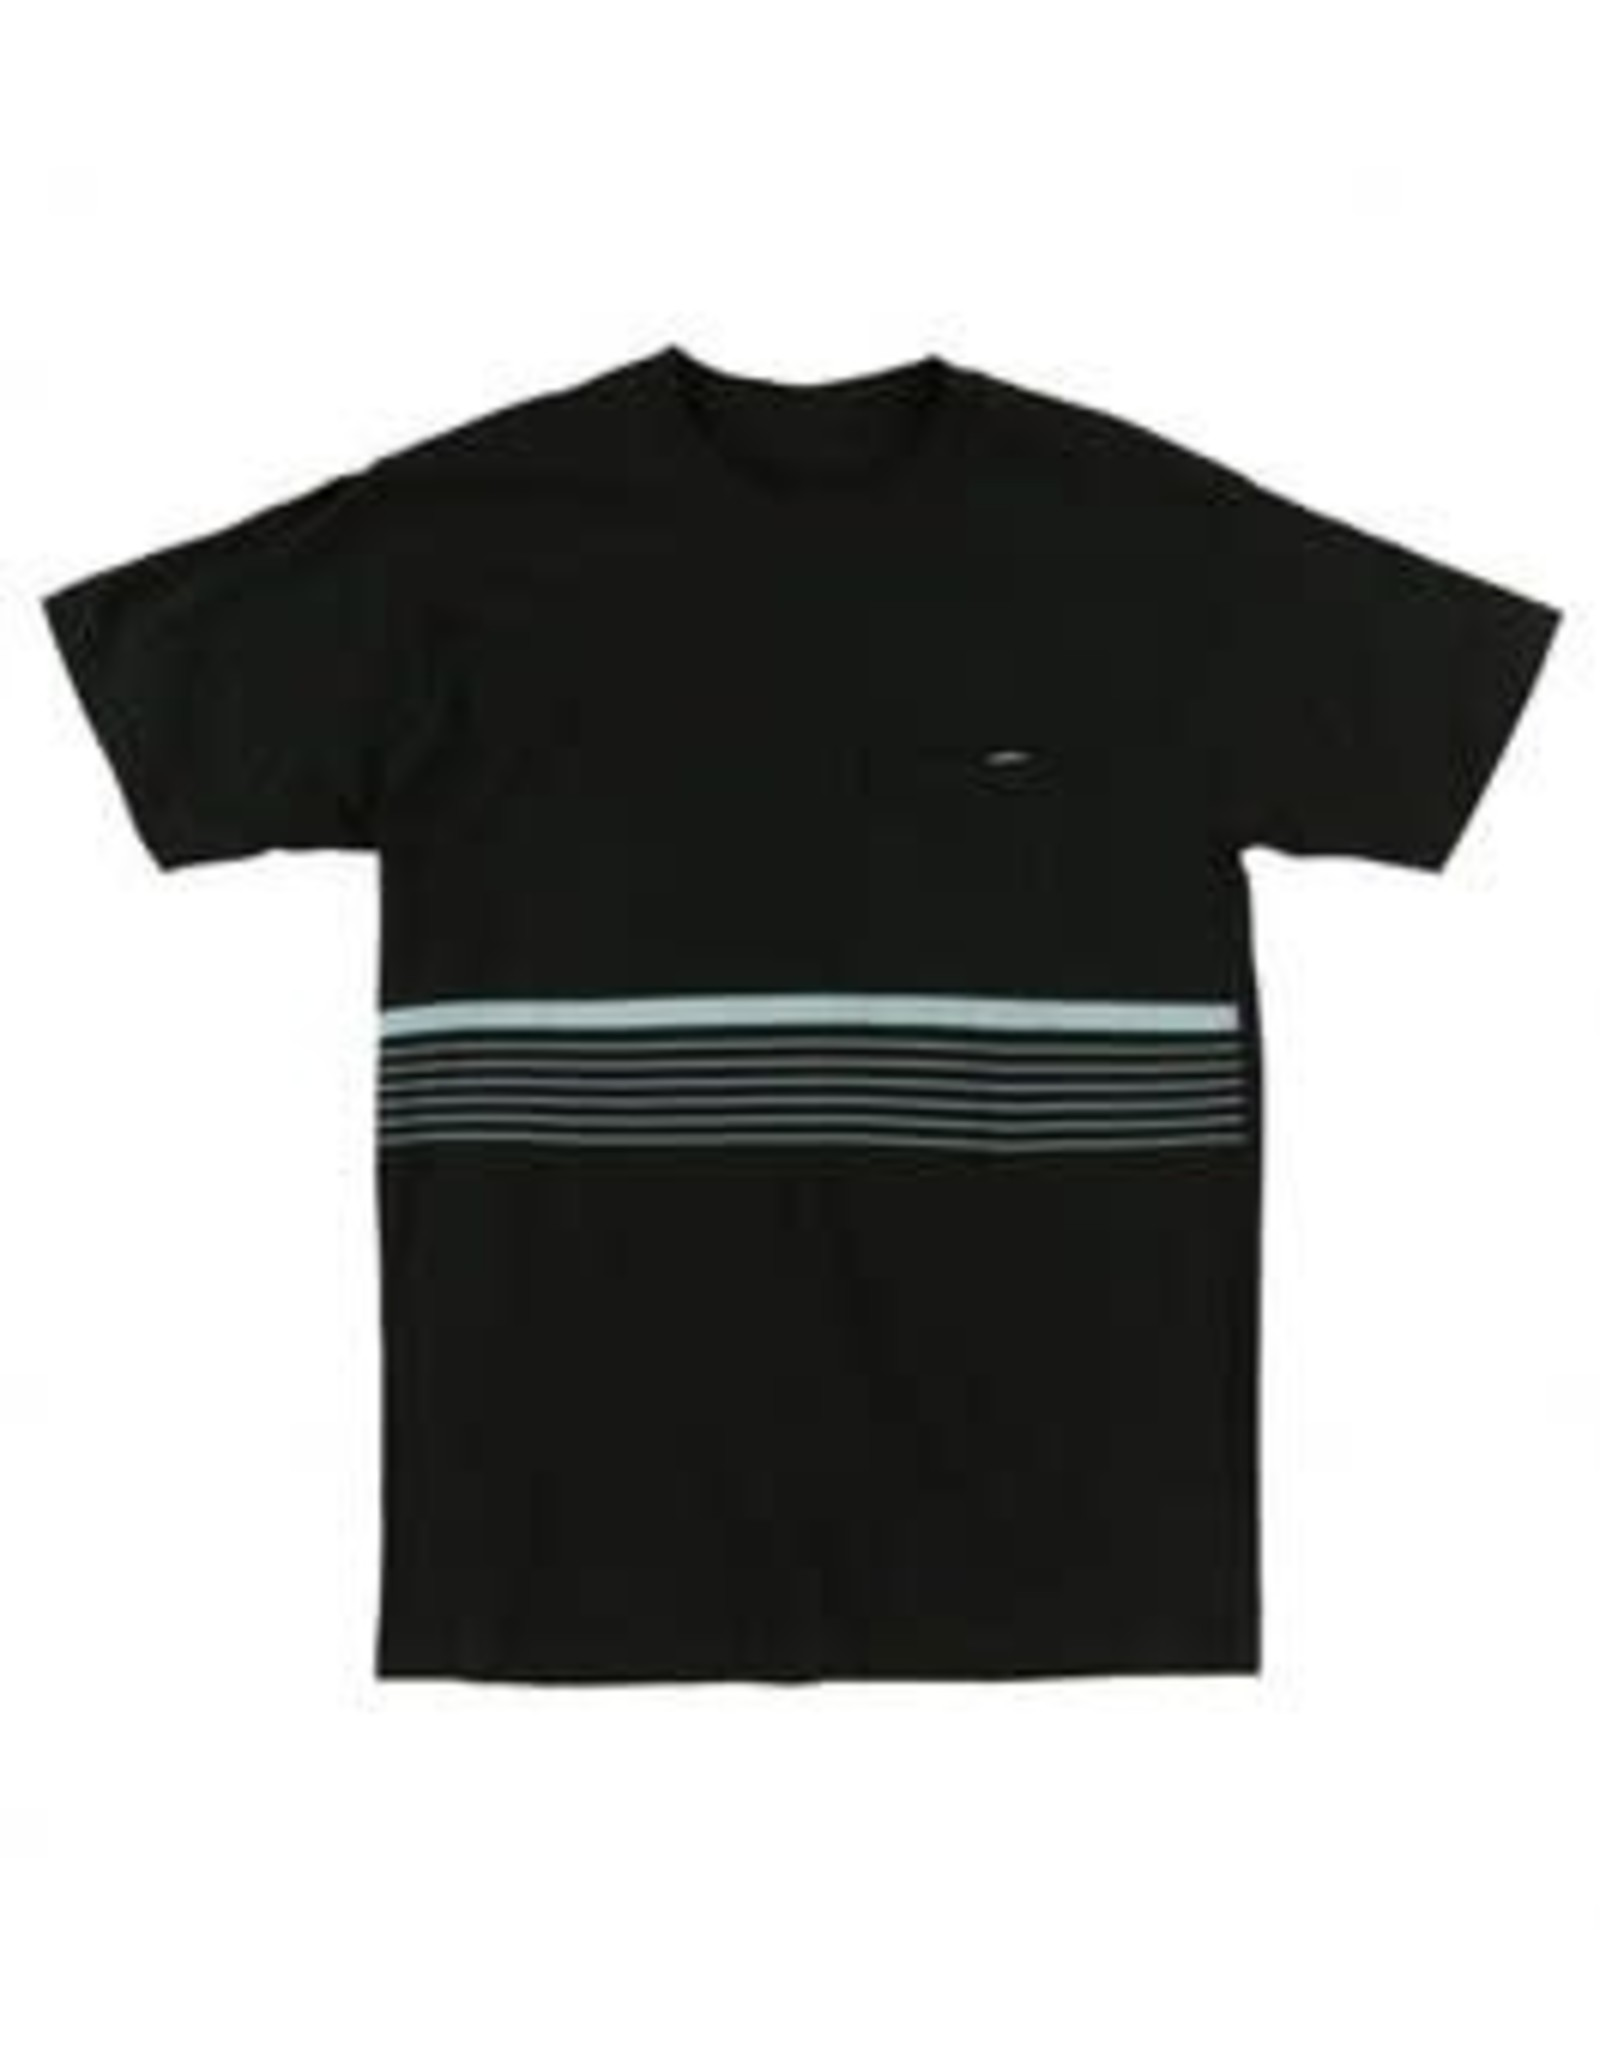 O'Neill Sportswear Aloha